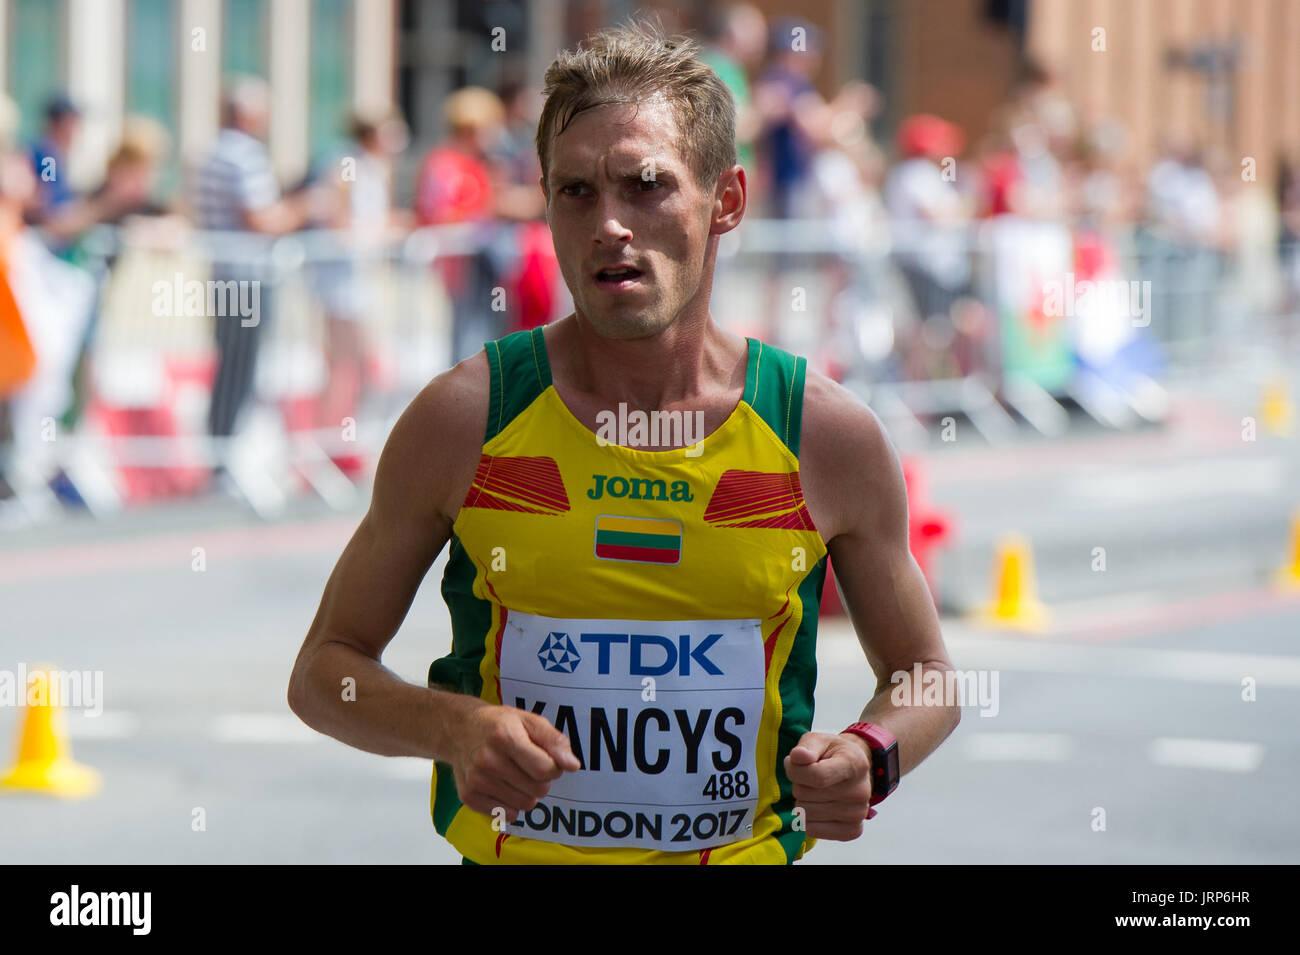 London, UK. 6th August, 2017. Remigijus Klancys (Lithuania) at the IAAF World Athletics Championships Men's Marathon Race Credit: Phil Swallow Photography/Alamy Live News - Stock Image